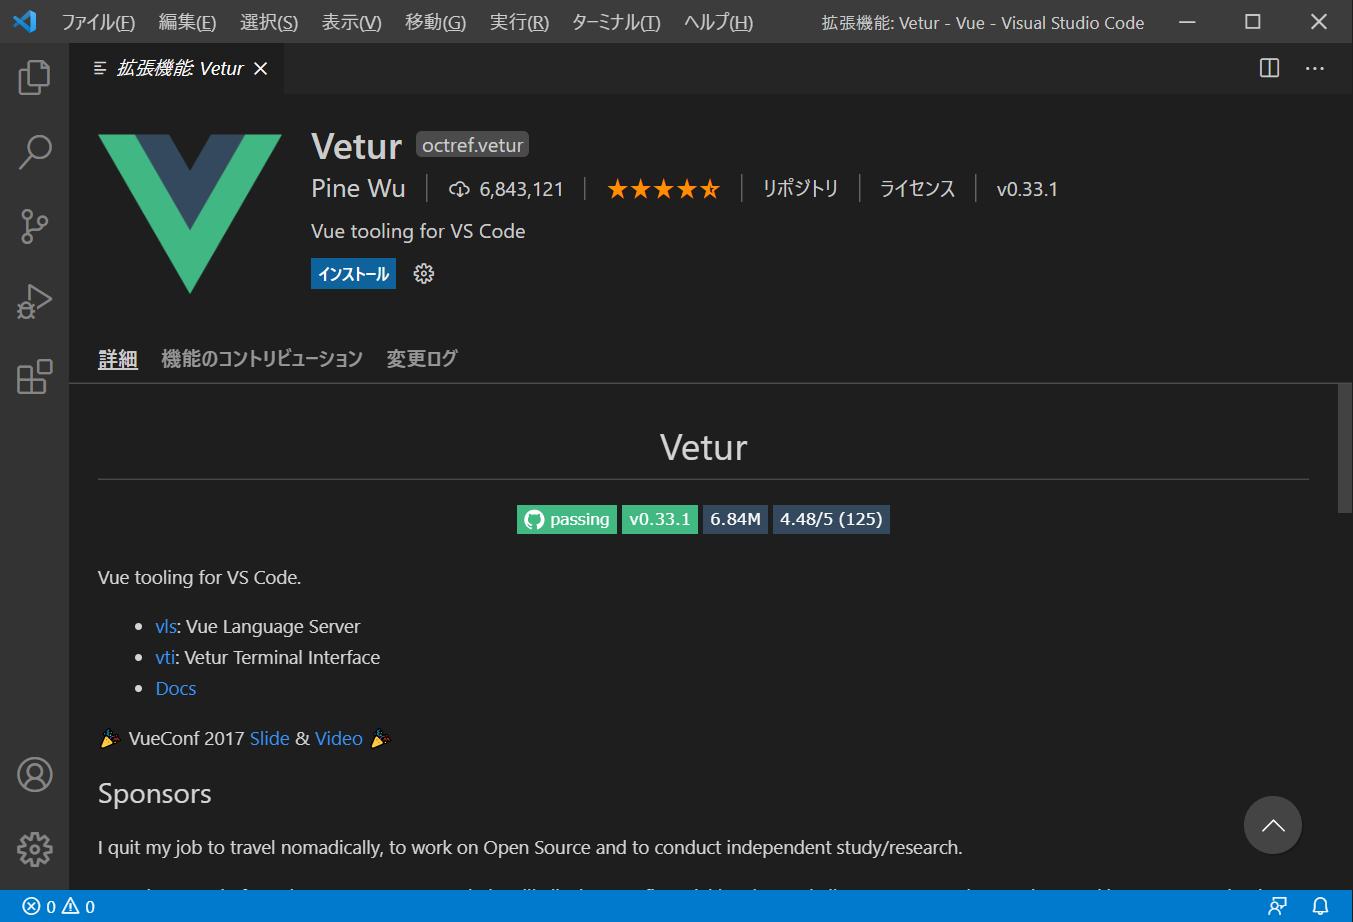 Visual Studio Code Vetur